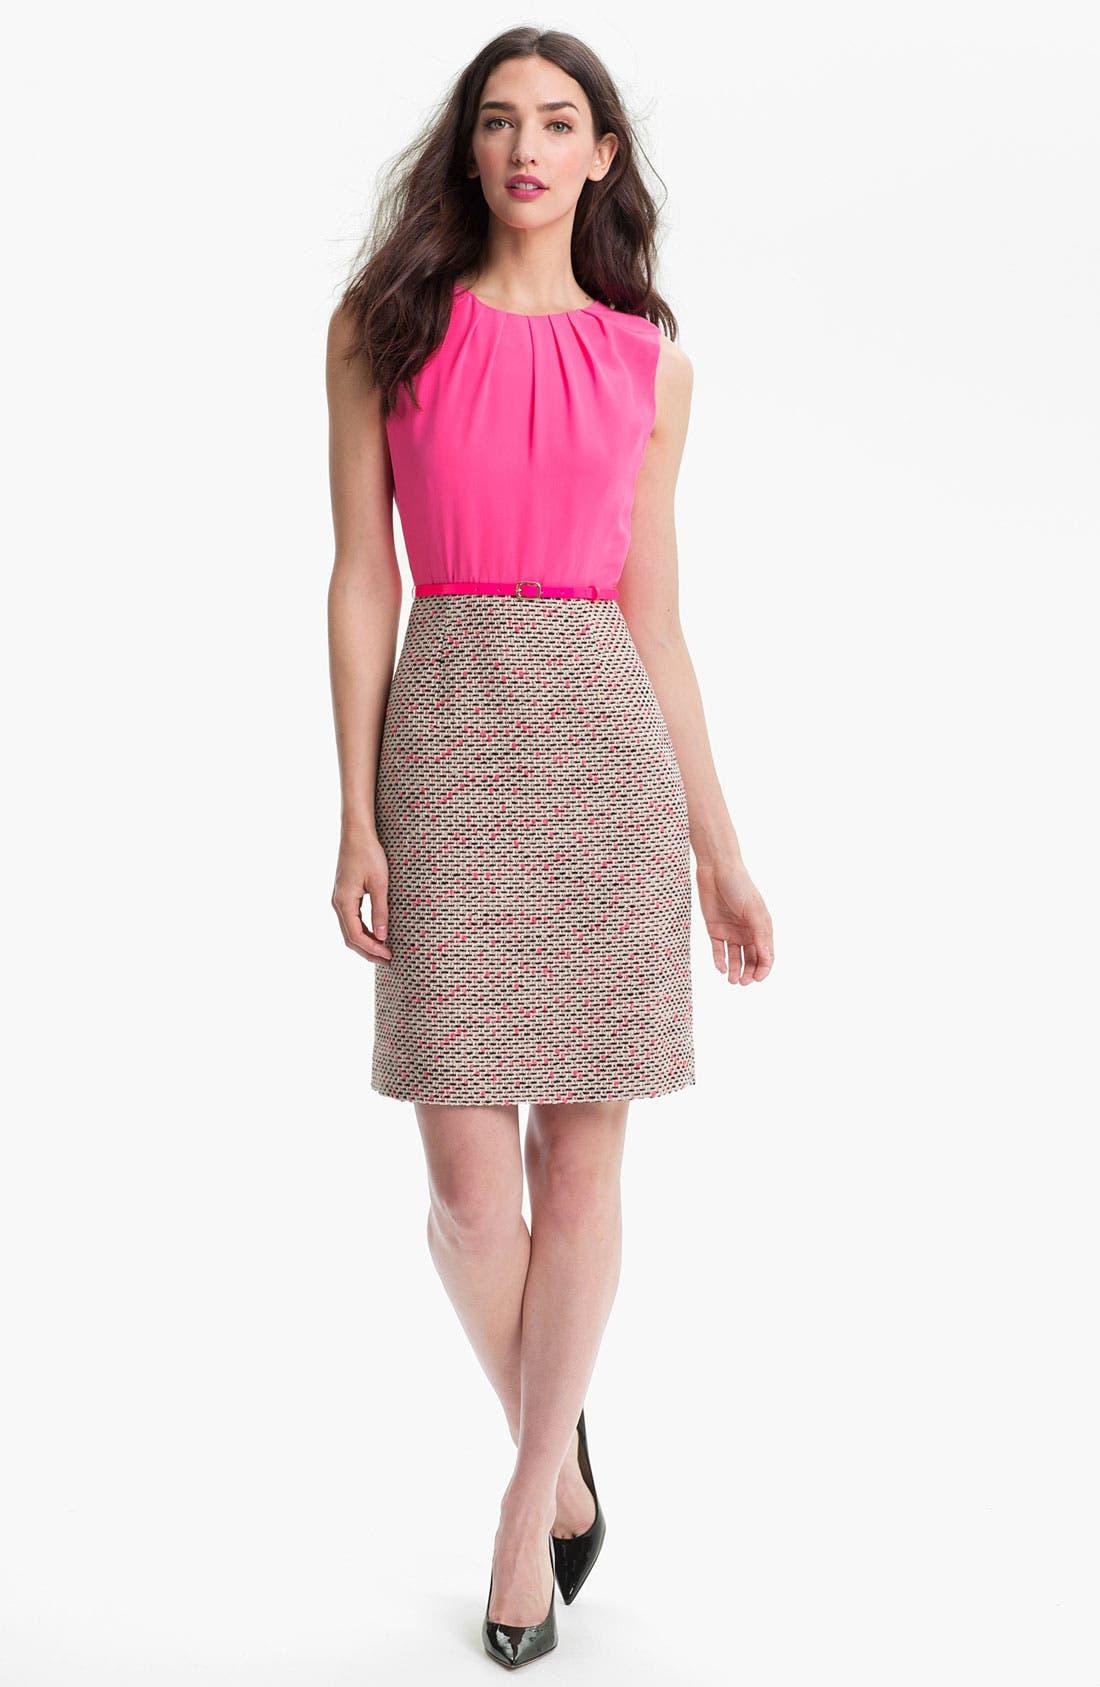 Alternate Image 1 Selected - kate spade new york 'evelyn' silk & tweed sheath dress